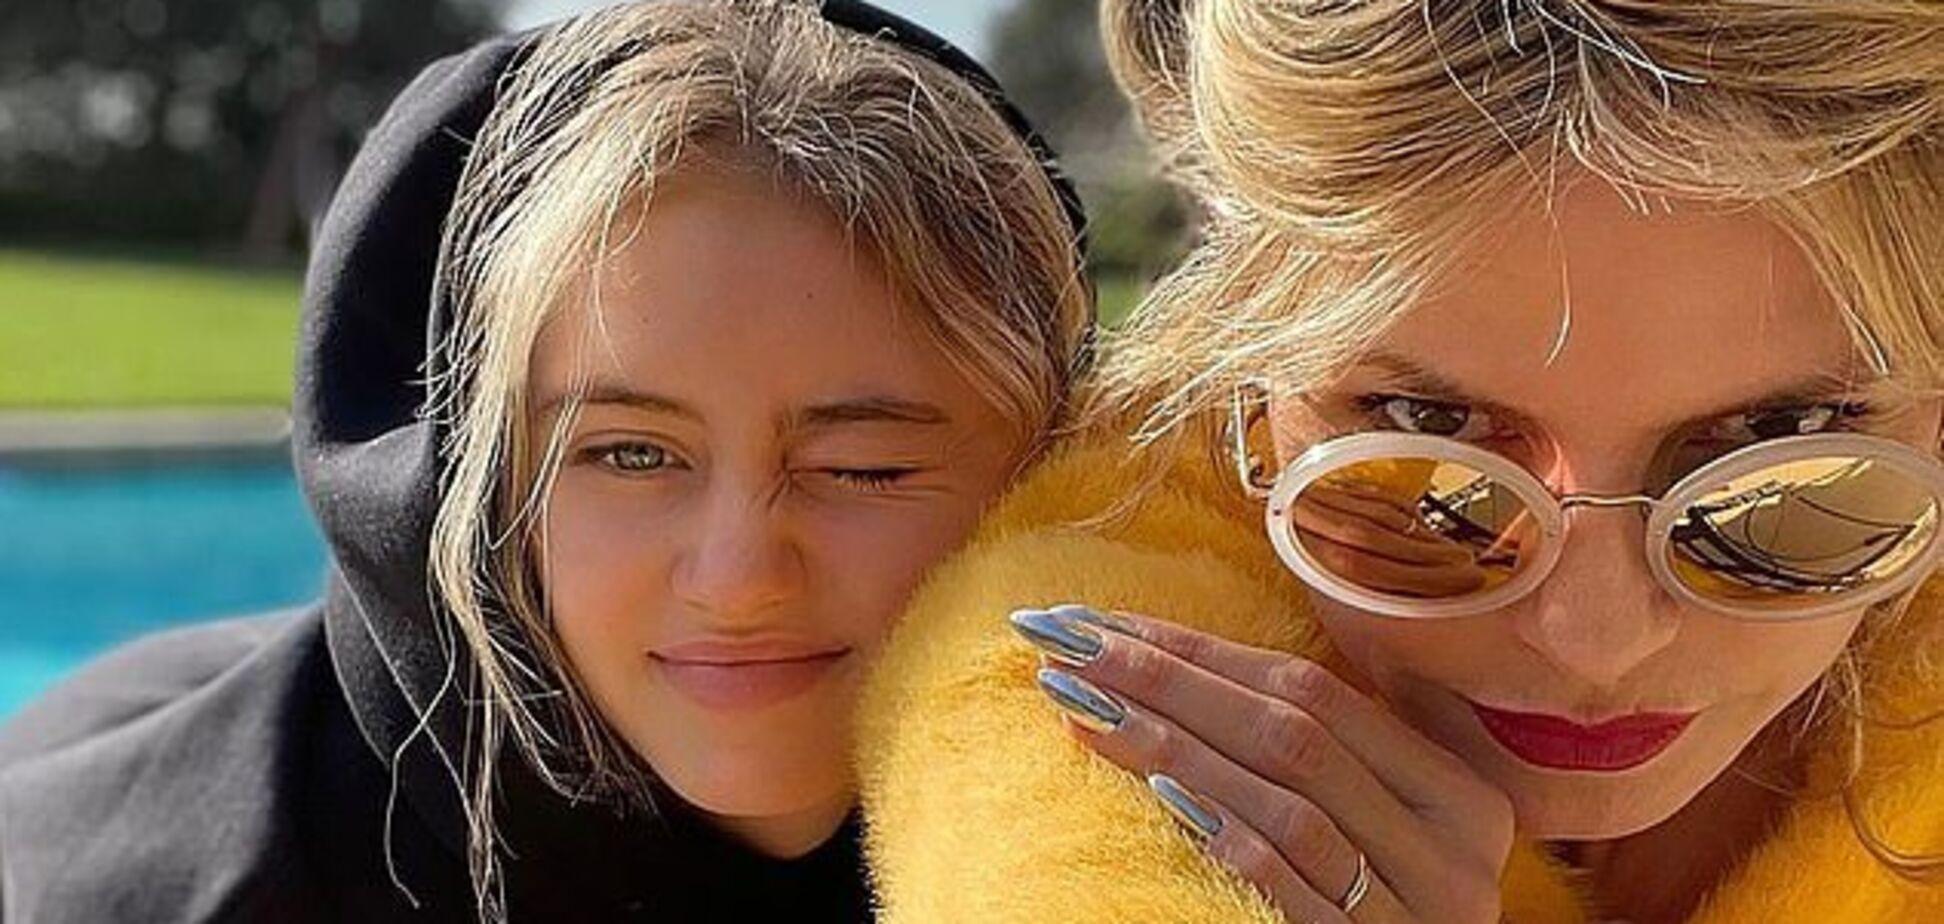 Дочь Хайди Клум снялась для обложки журнала